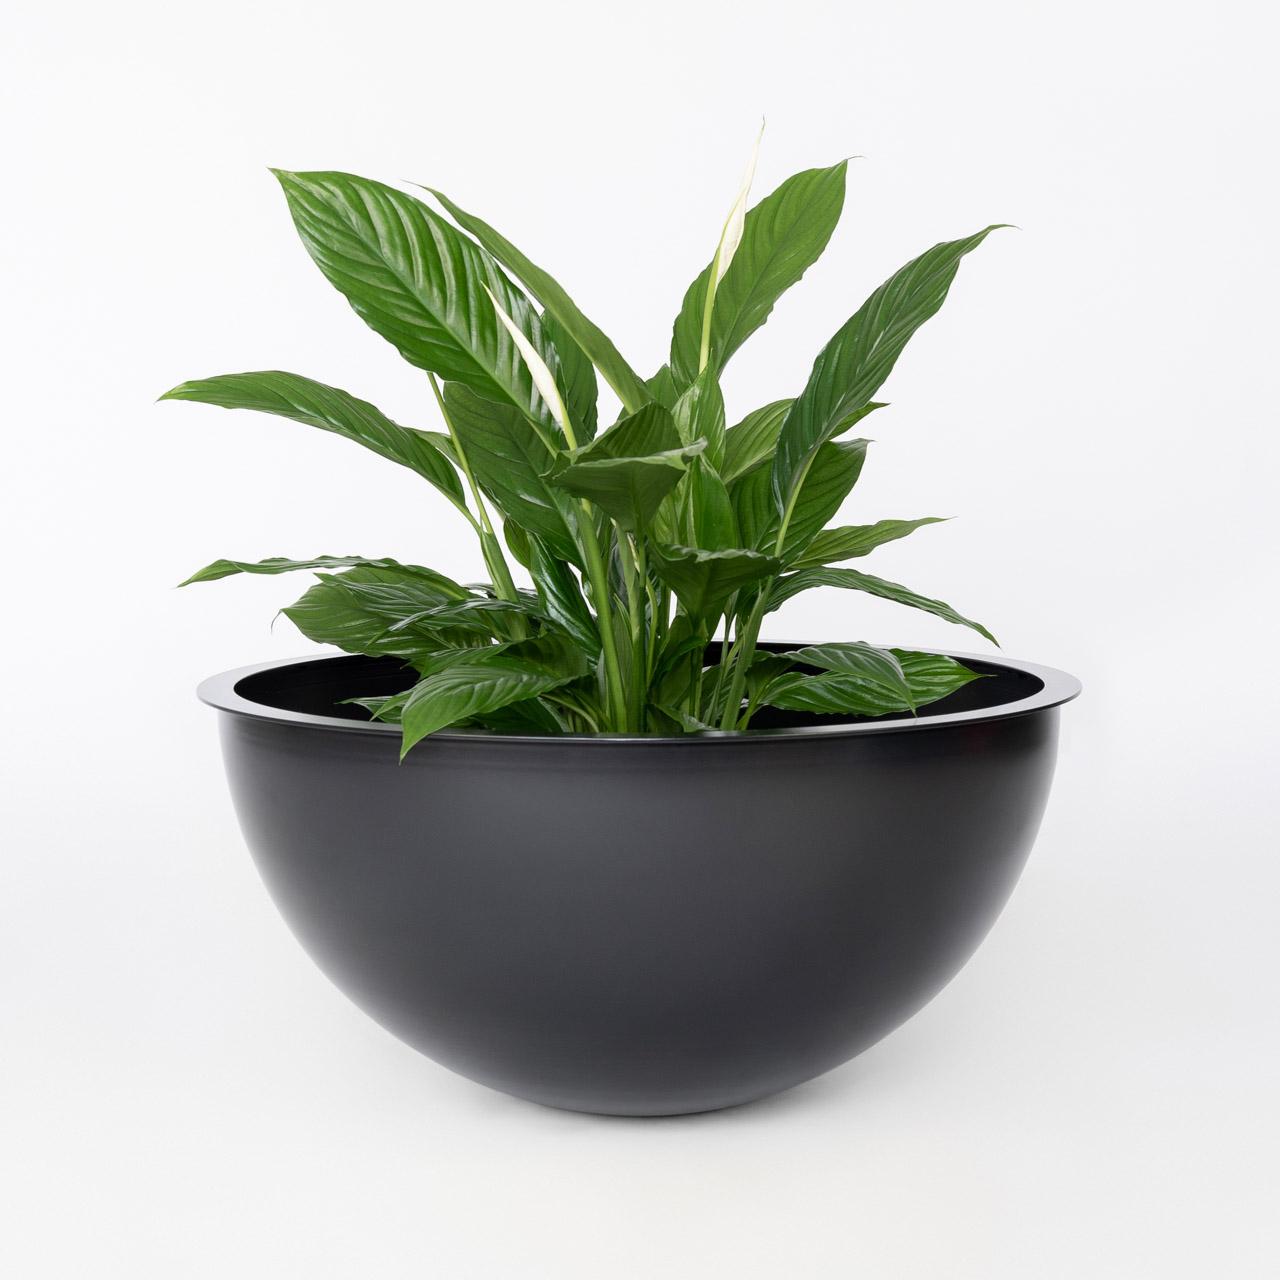 Zwarte Sunwood NOBL Design Vaas op witte achtergrond met groen witte plant